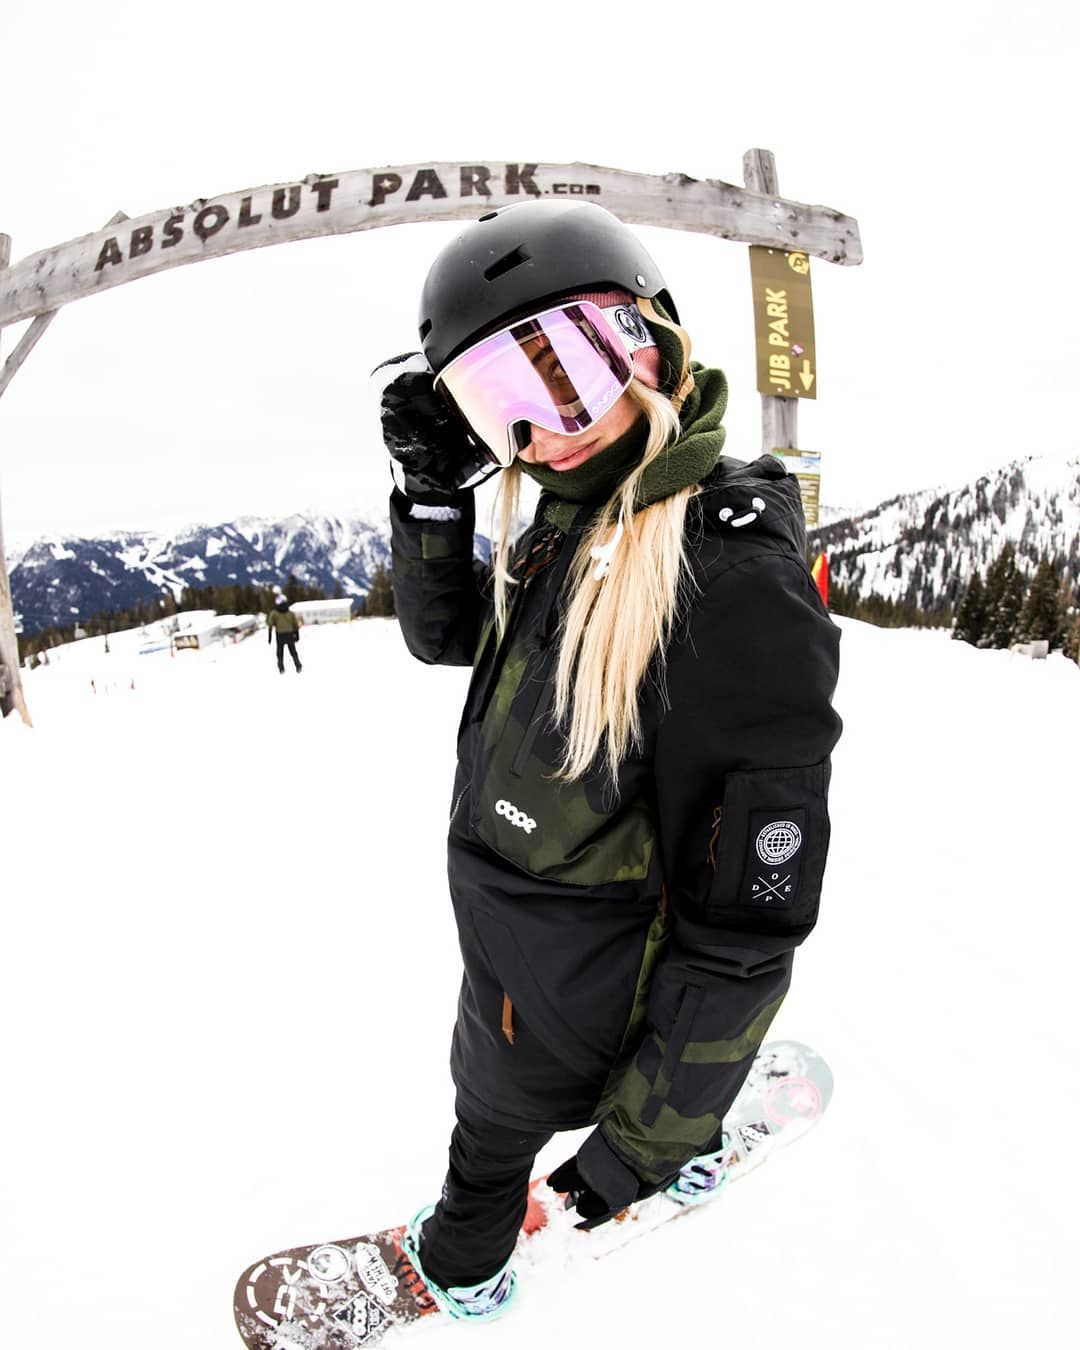 Snowboard Girl Snowboarding Women Snowboarding Outfit Snowboard Gear Womens Snowboard Girl Snowboarding Outfit Snowboarding Women